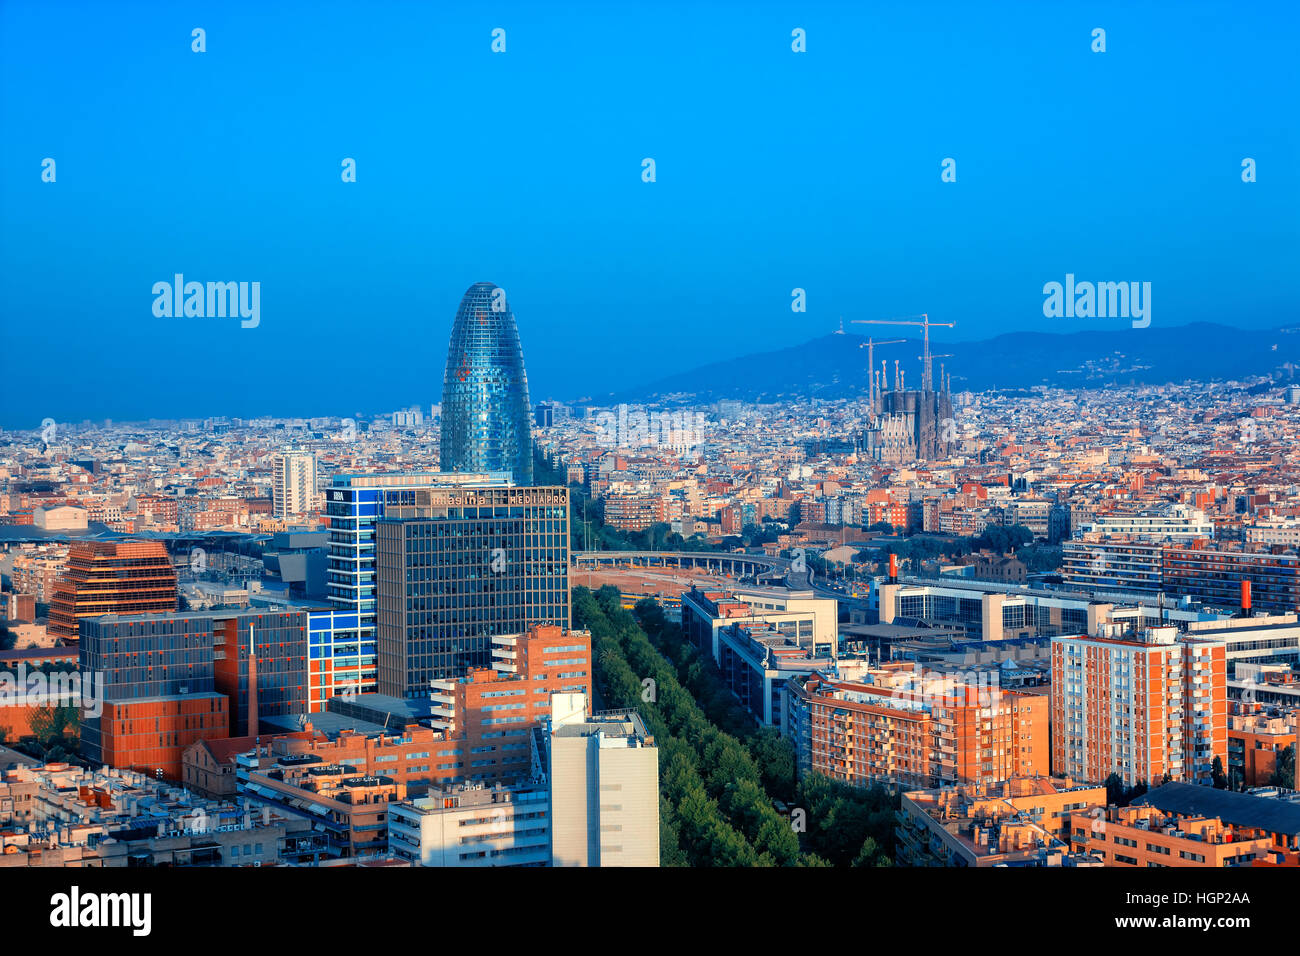 Barcelona skyline - Stock Image